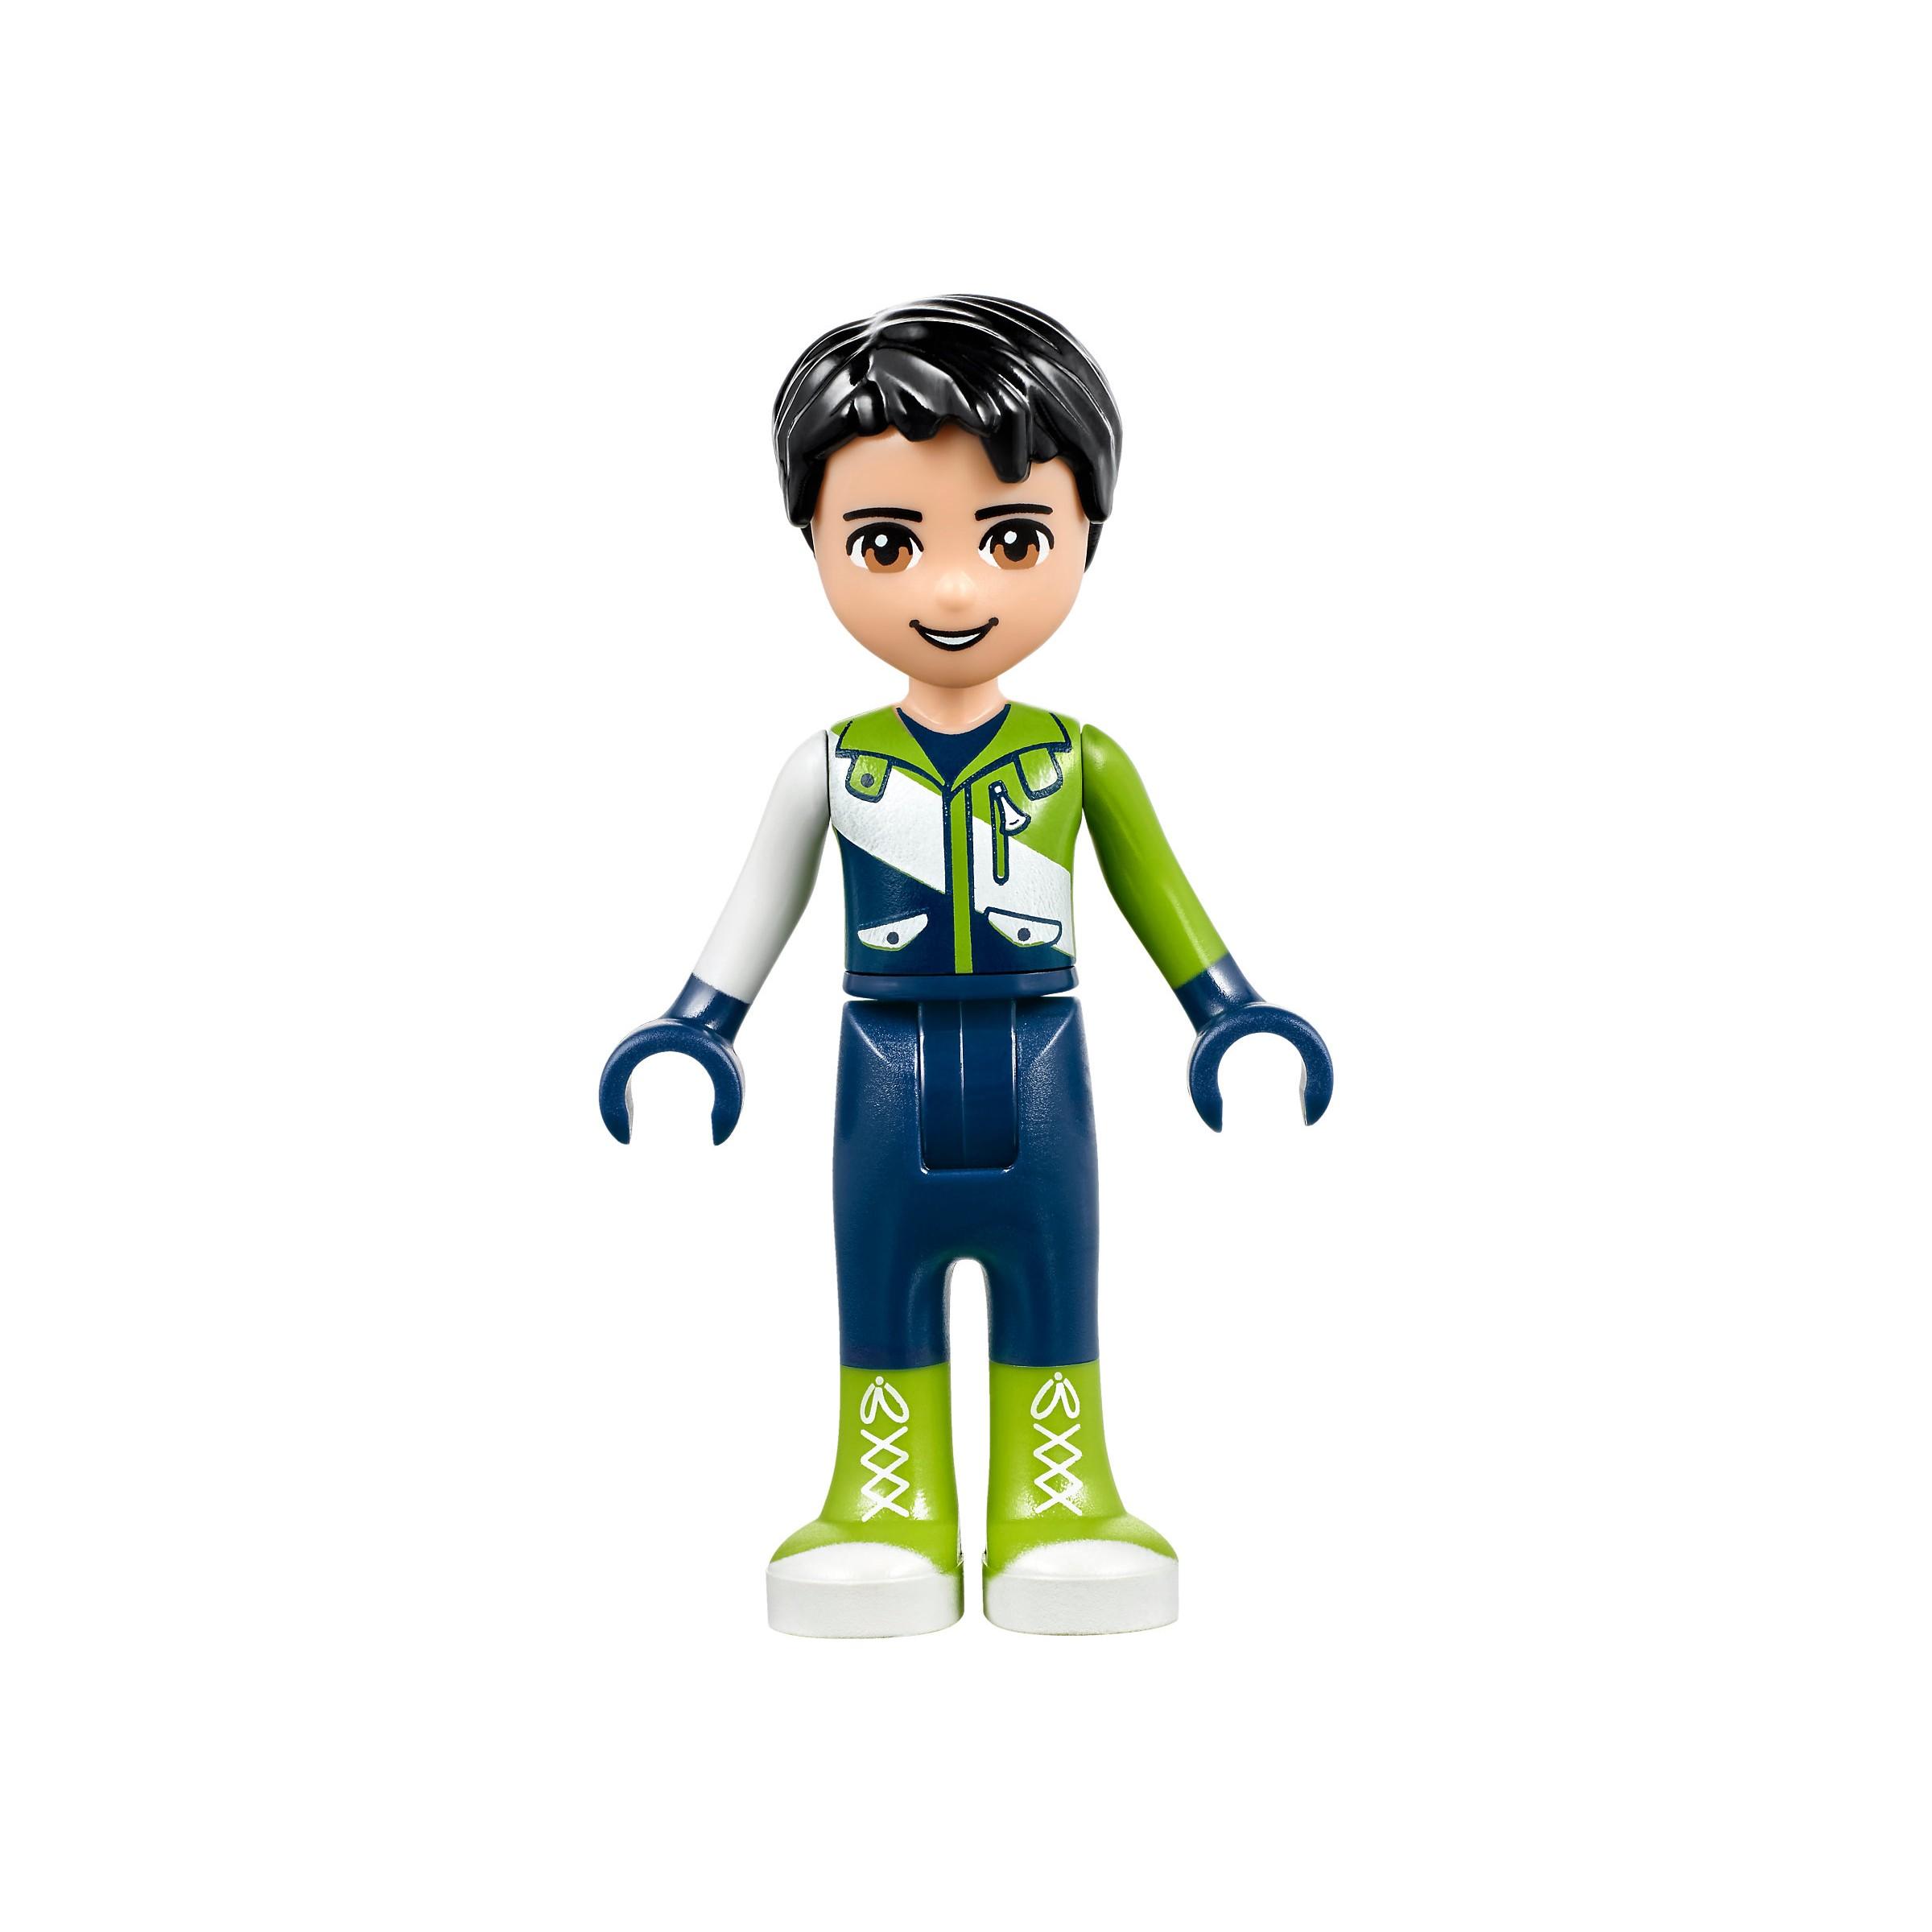 LEGO 41322 Friends Snow Resort Ice Rink at Hobby Warehouse | 2400 x 2400 jpeg 255kB